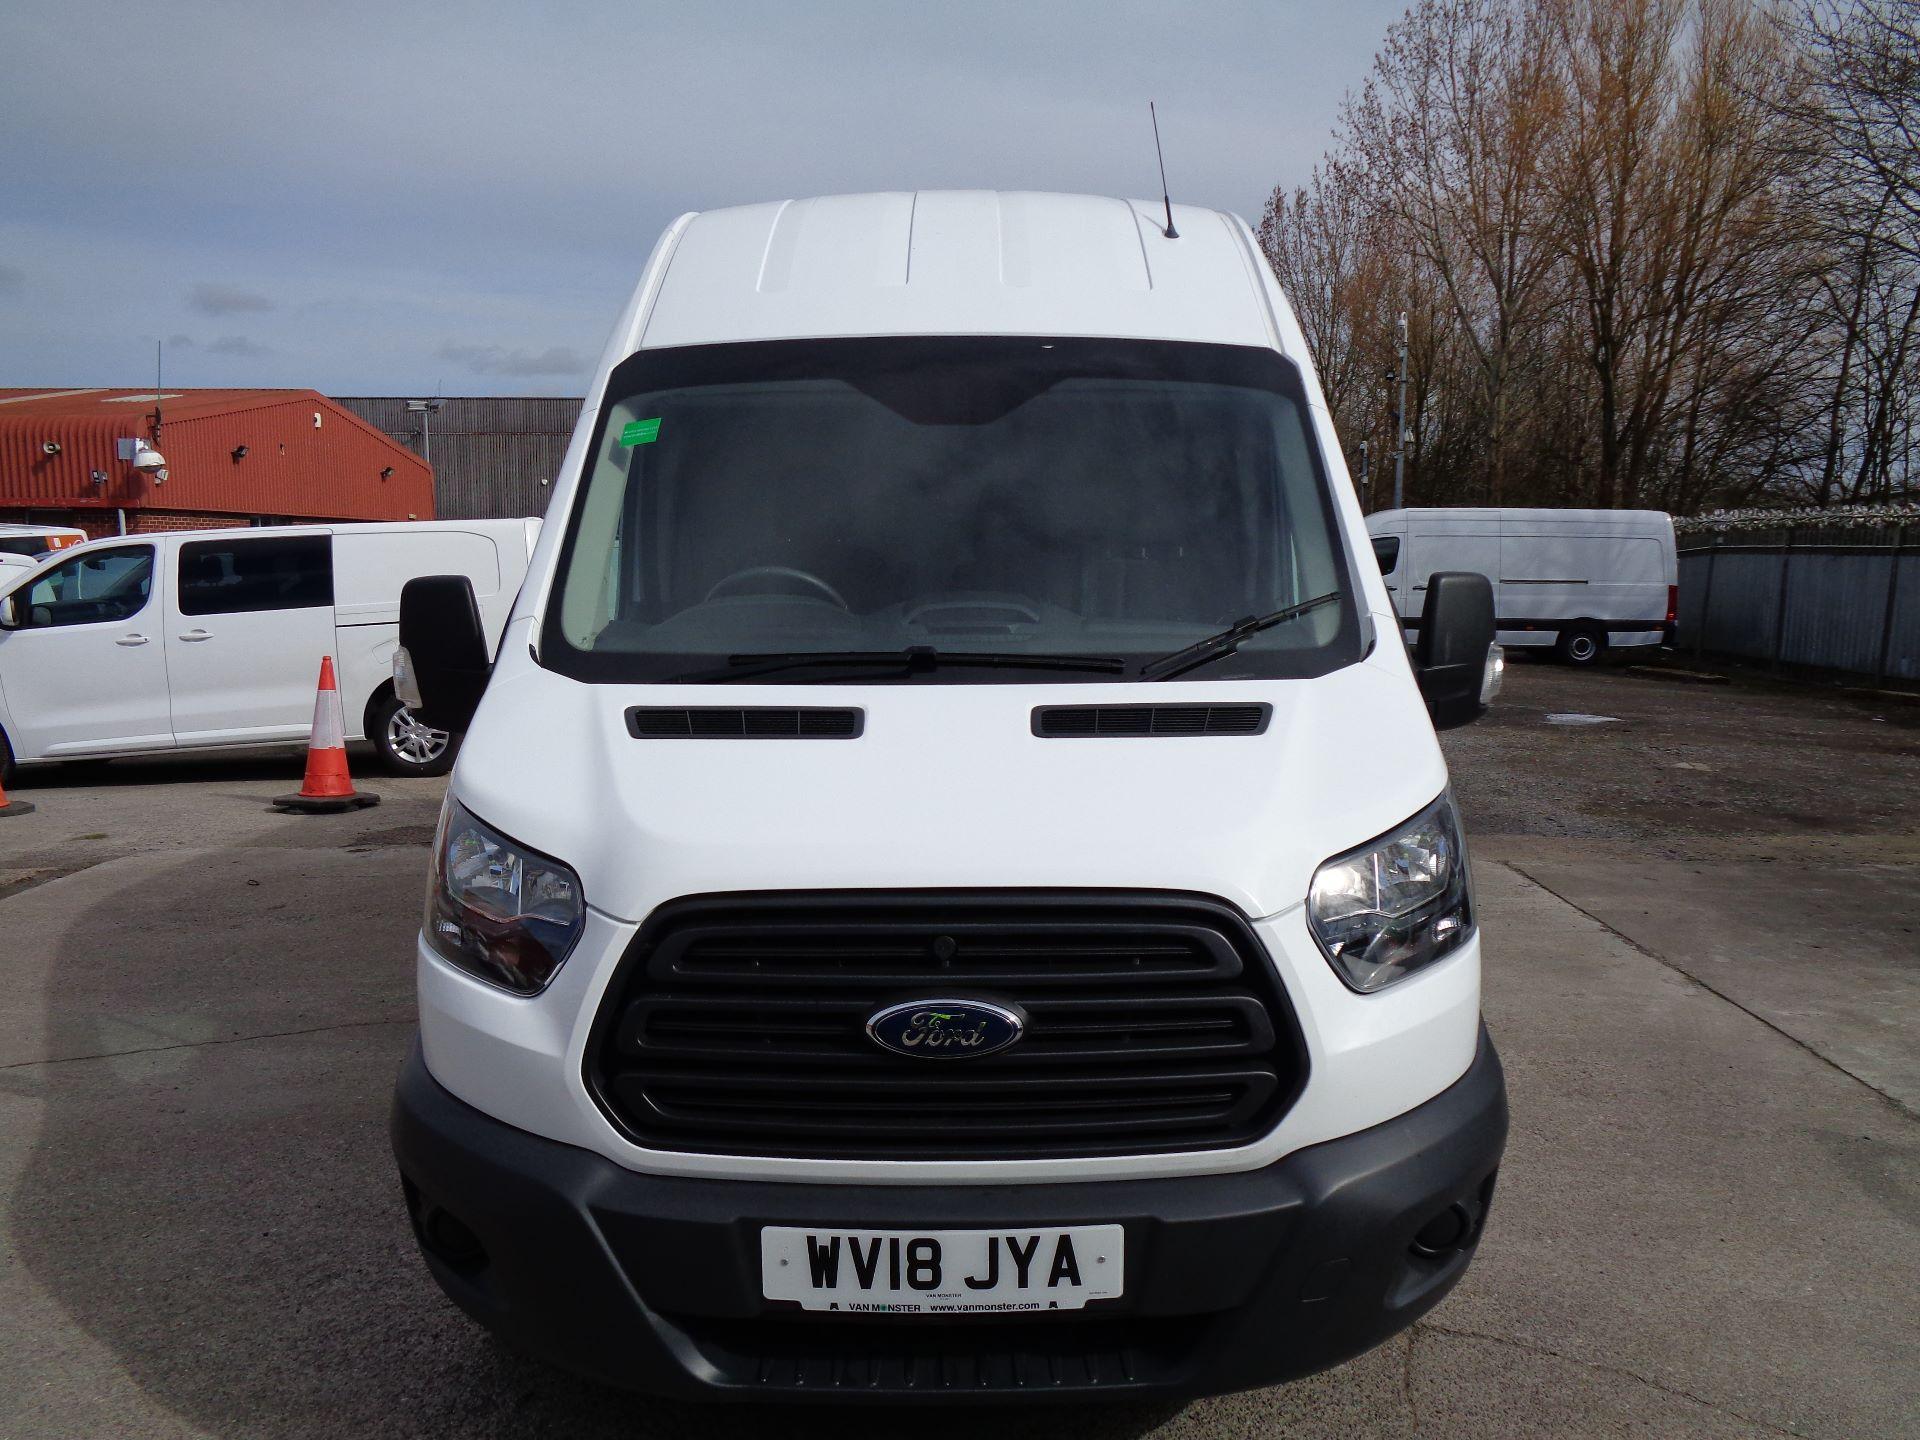 2018 Ford Transit L3 H3 VAN 130PS EURO 6 (WV18JYA) Image 3